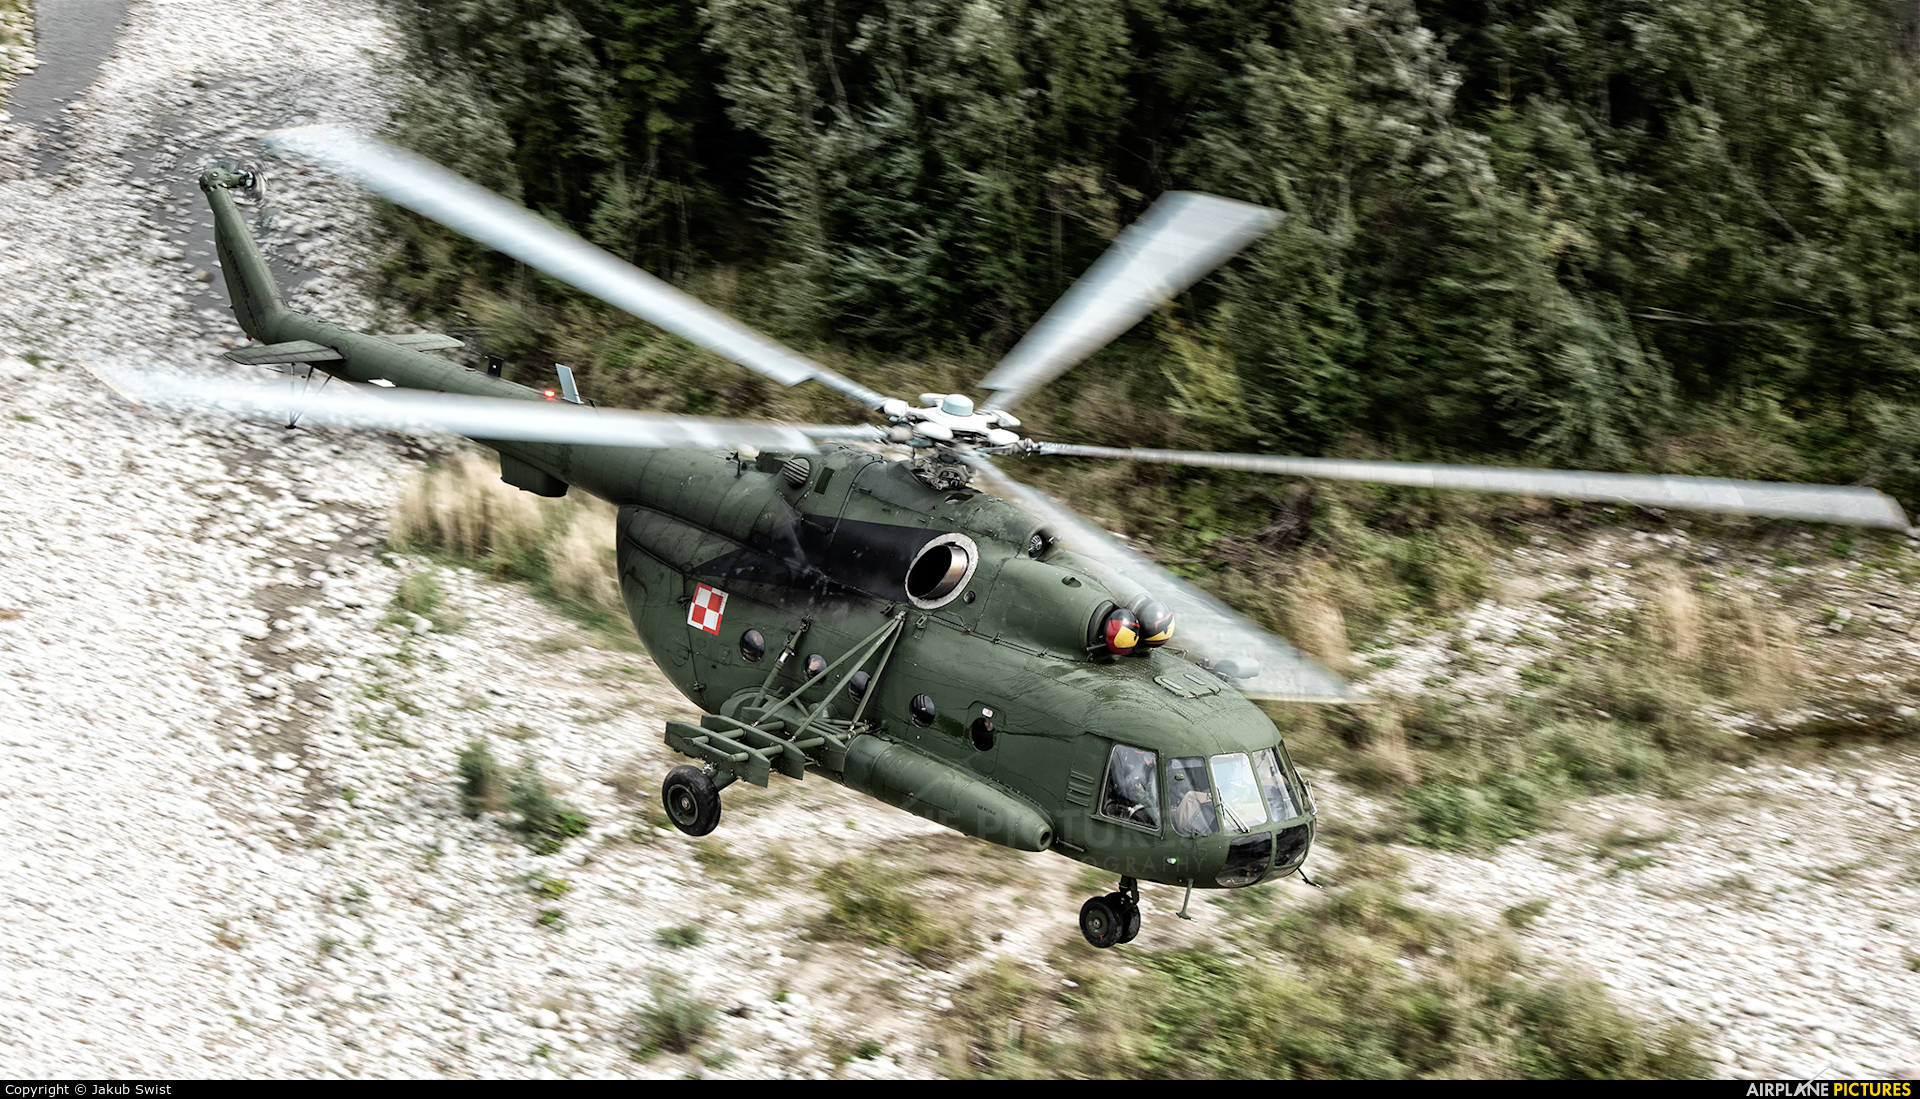 Poland - Air Force 601 aircraft at In Flight - Poland